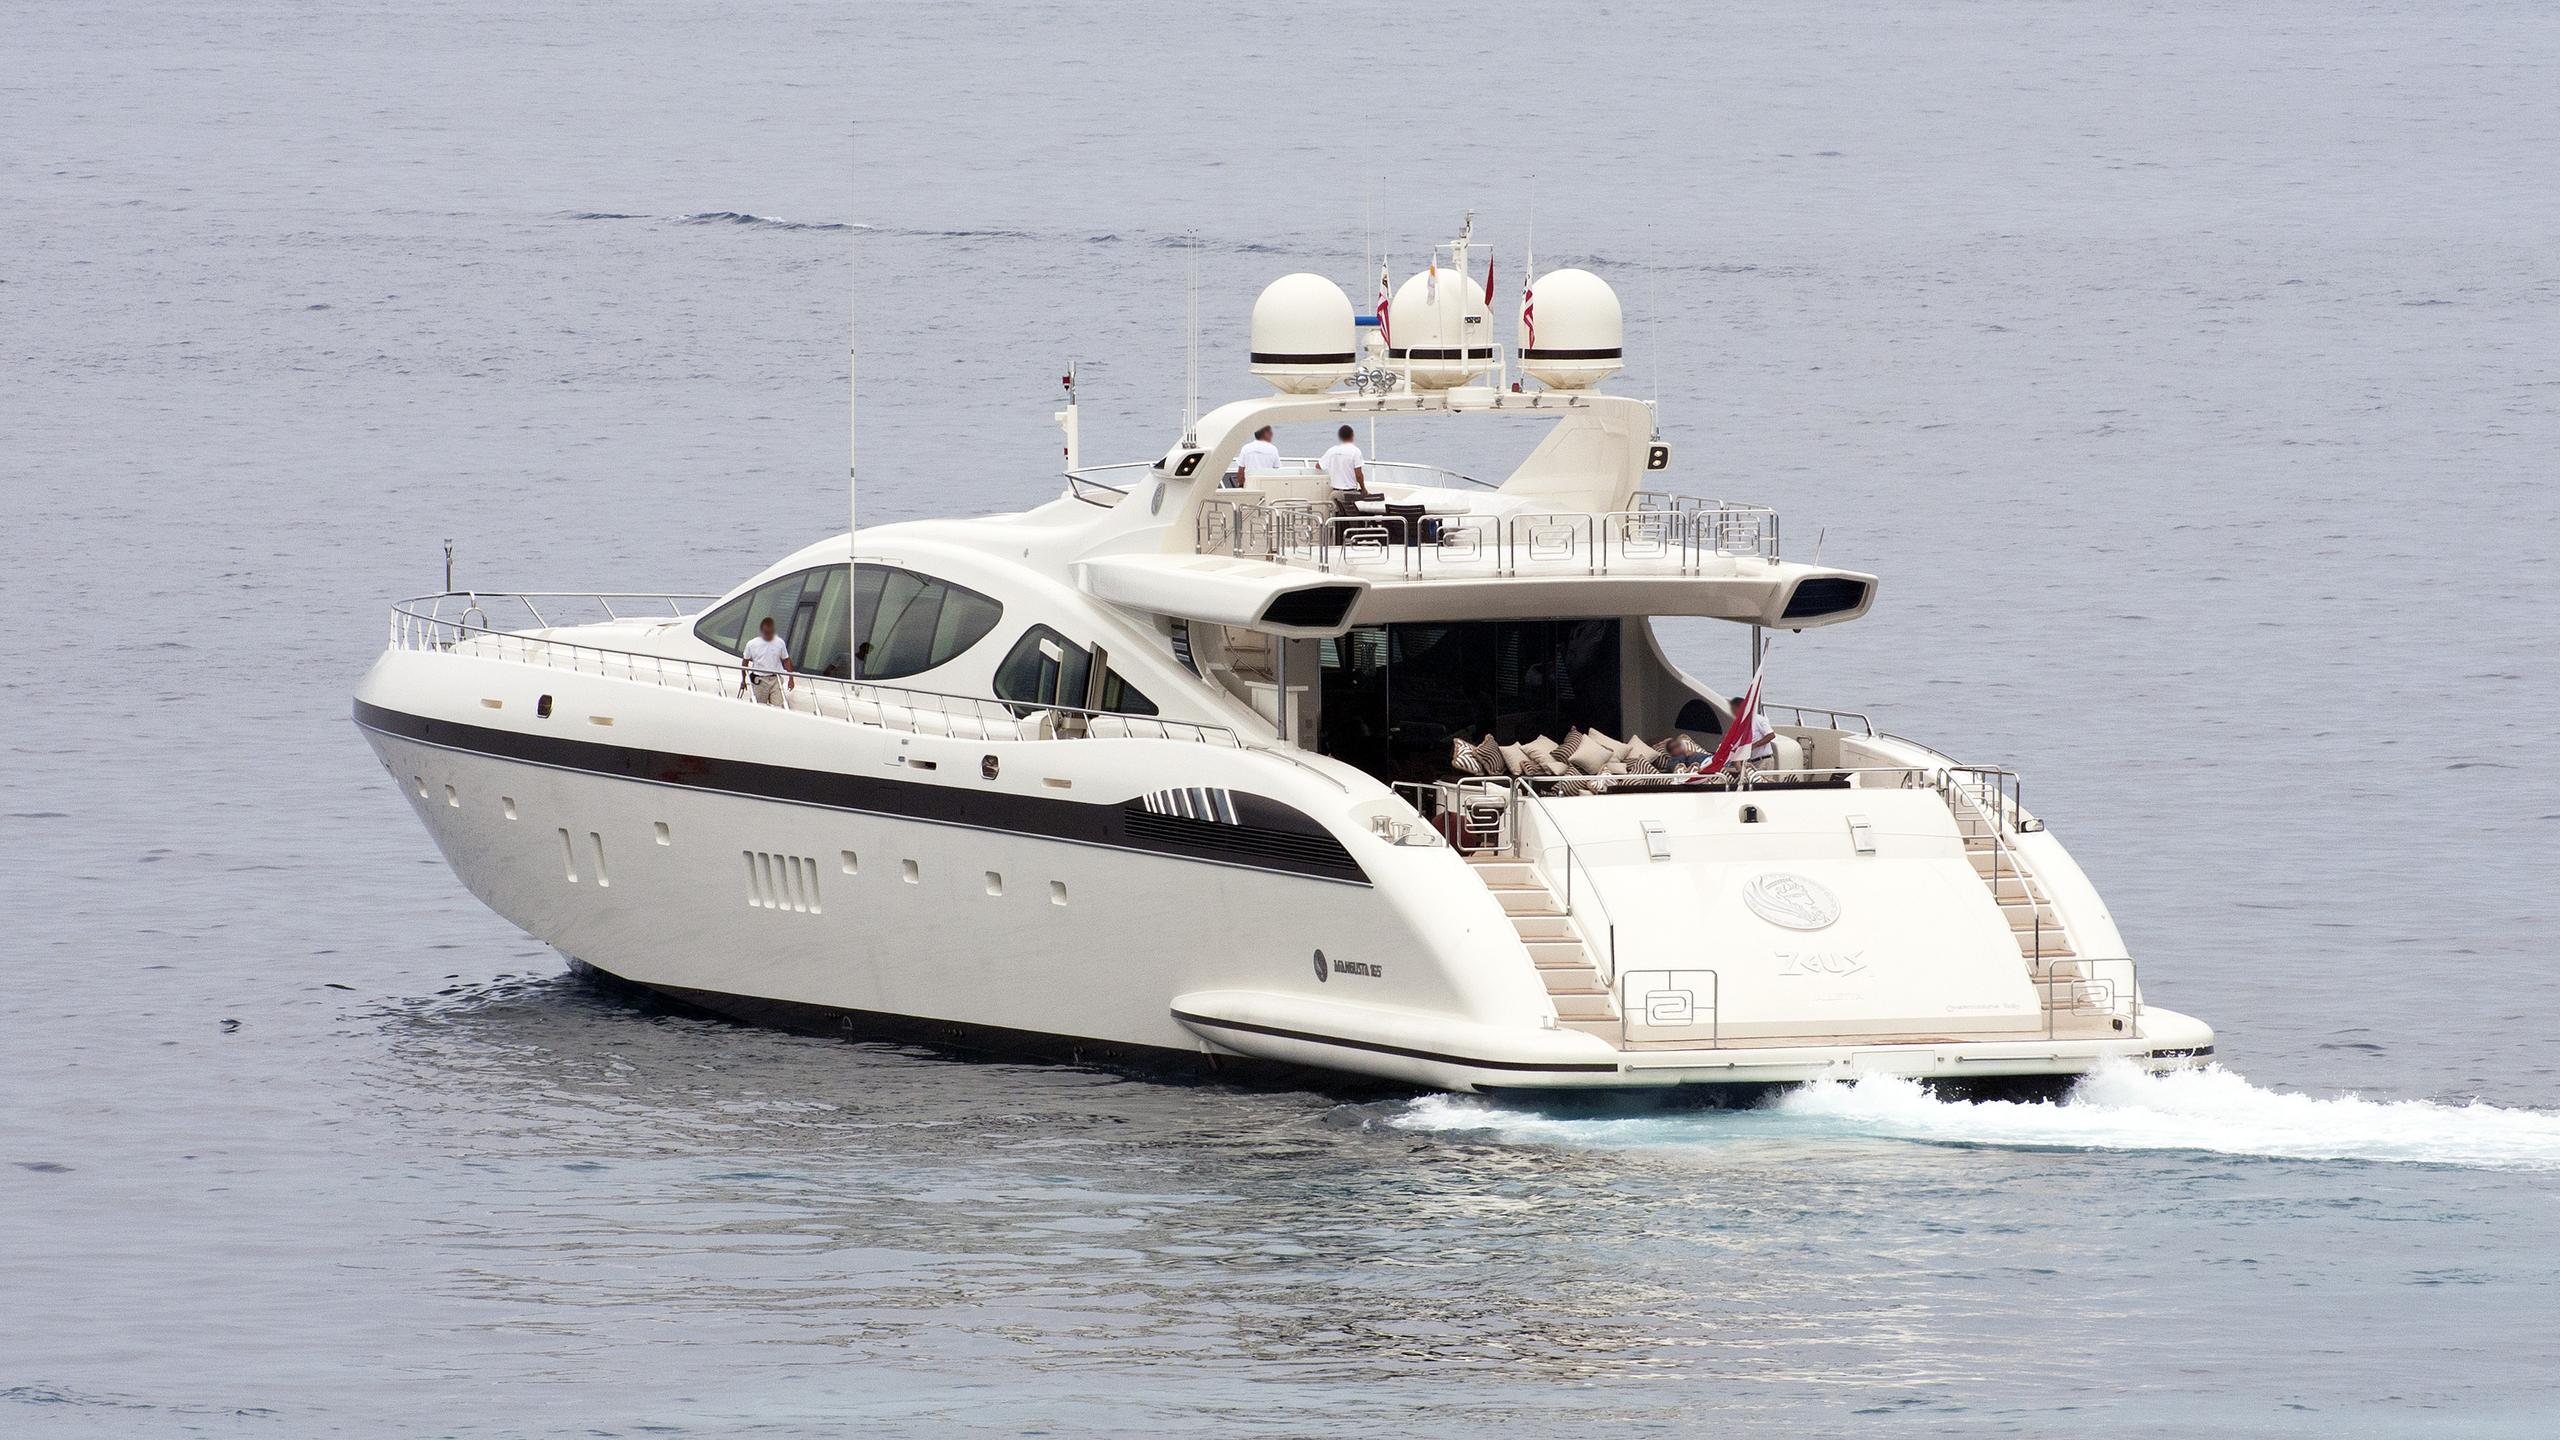 zeus-motor-yacht-overmarine-2009-50m-stern